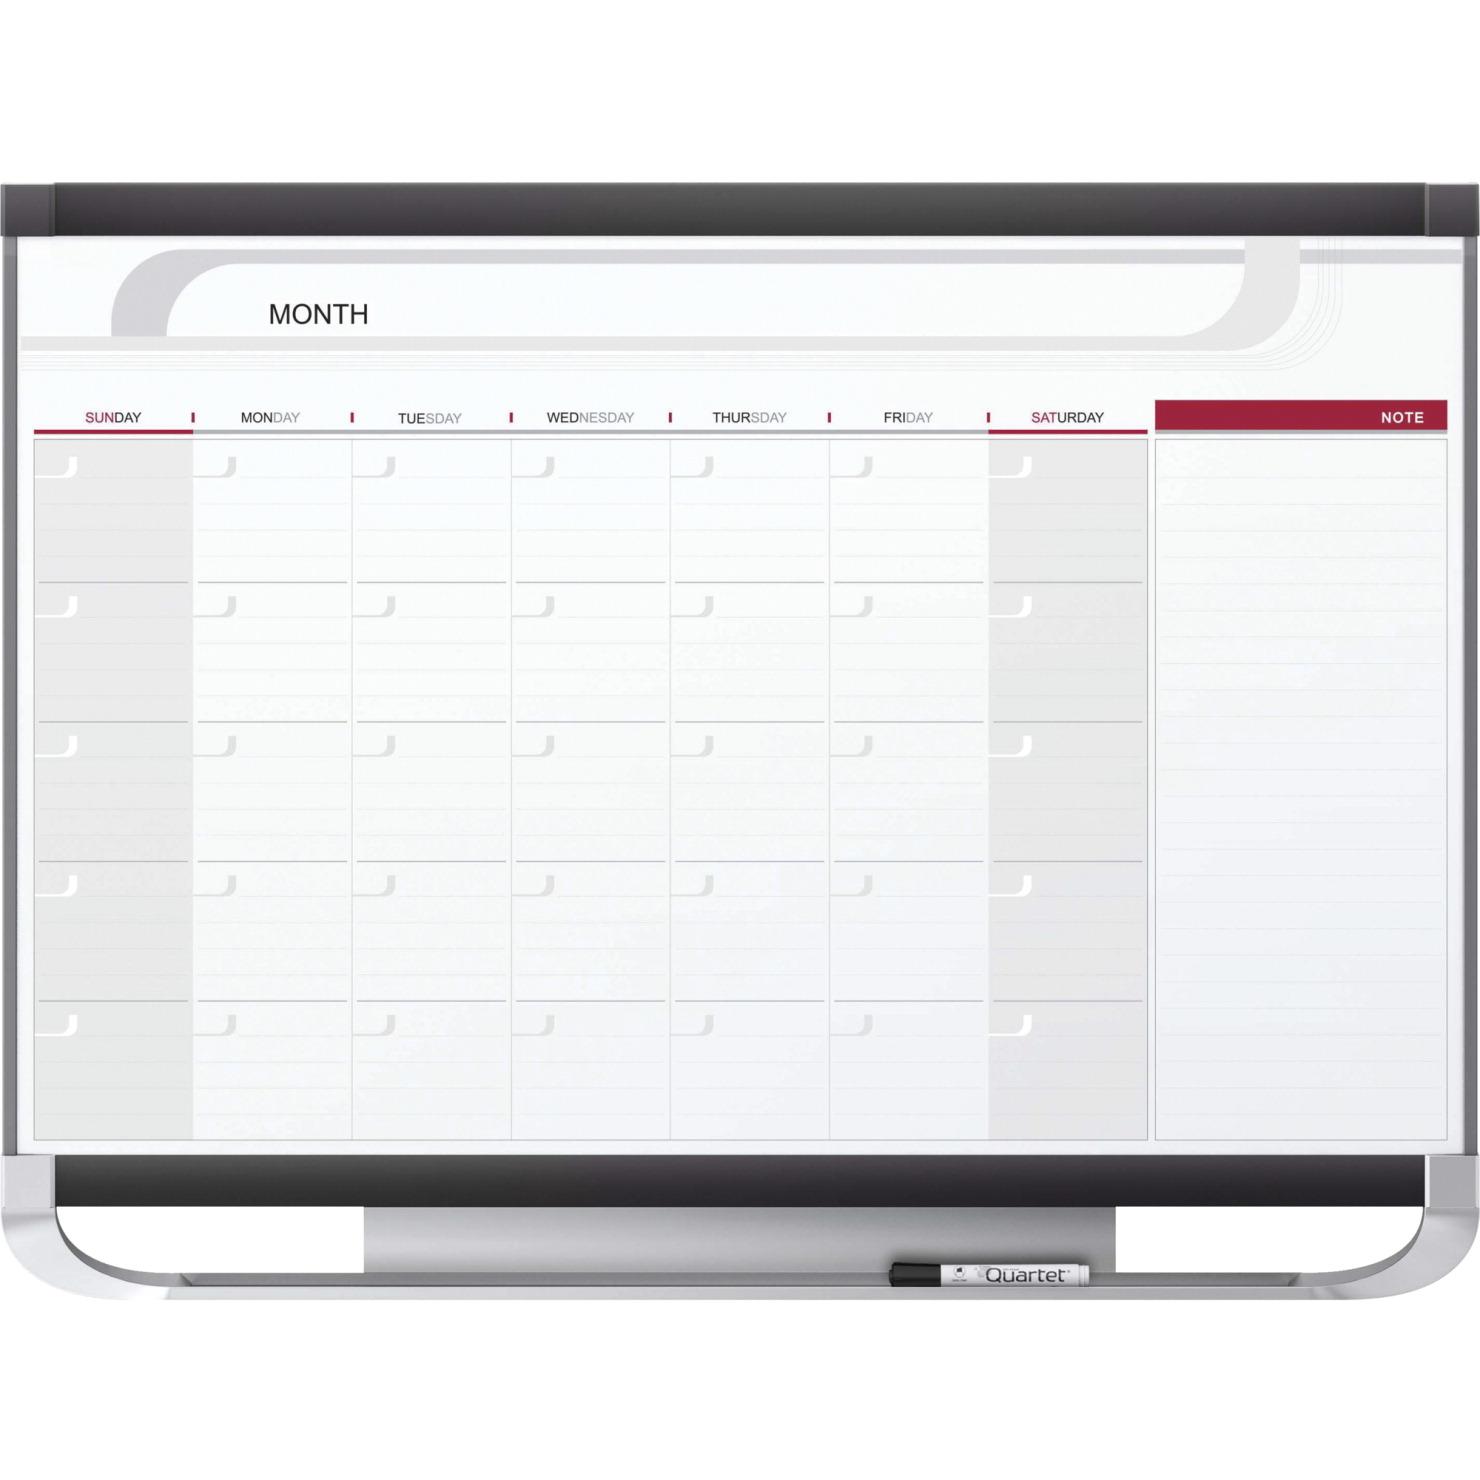 Dry Erase Calendar Staples : Quartet total erase monthly undated calendar with marker